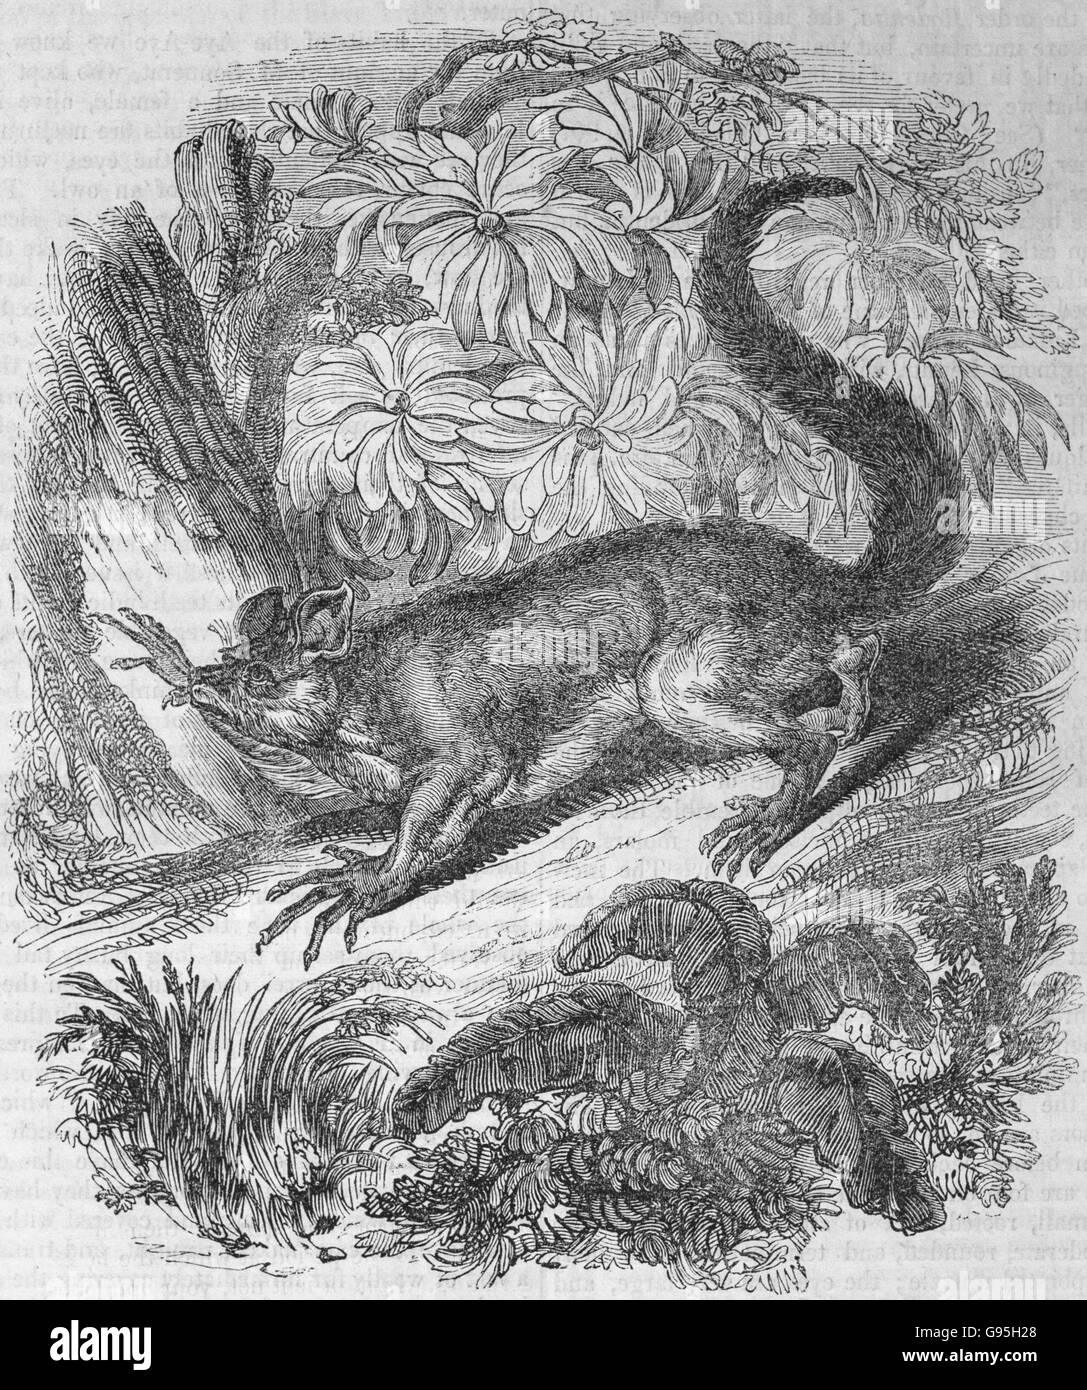 The Aye-Aye. From a mid 19th century engraving. The aye-aye (Daubentonia madagascariensis) is a lemur, a strepsirrhine - Stock Image